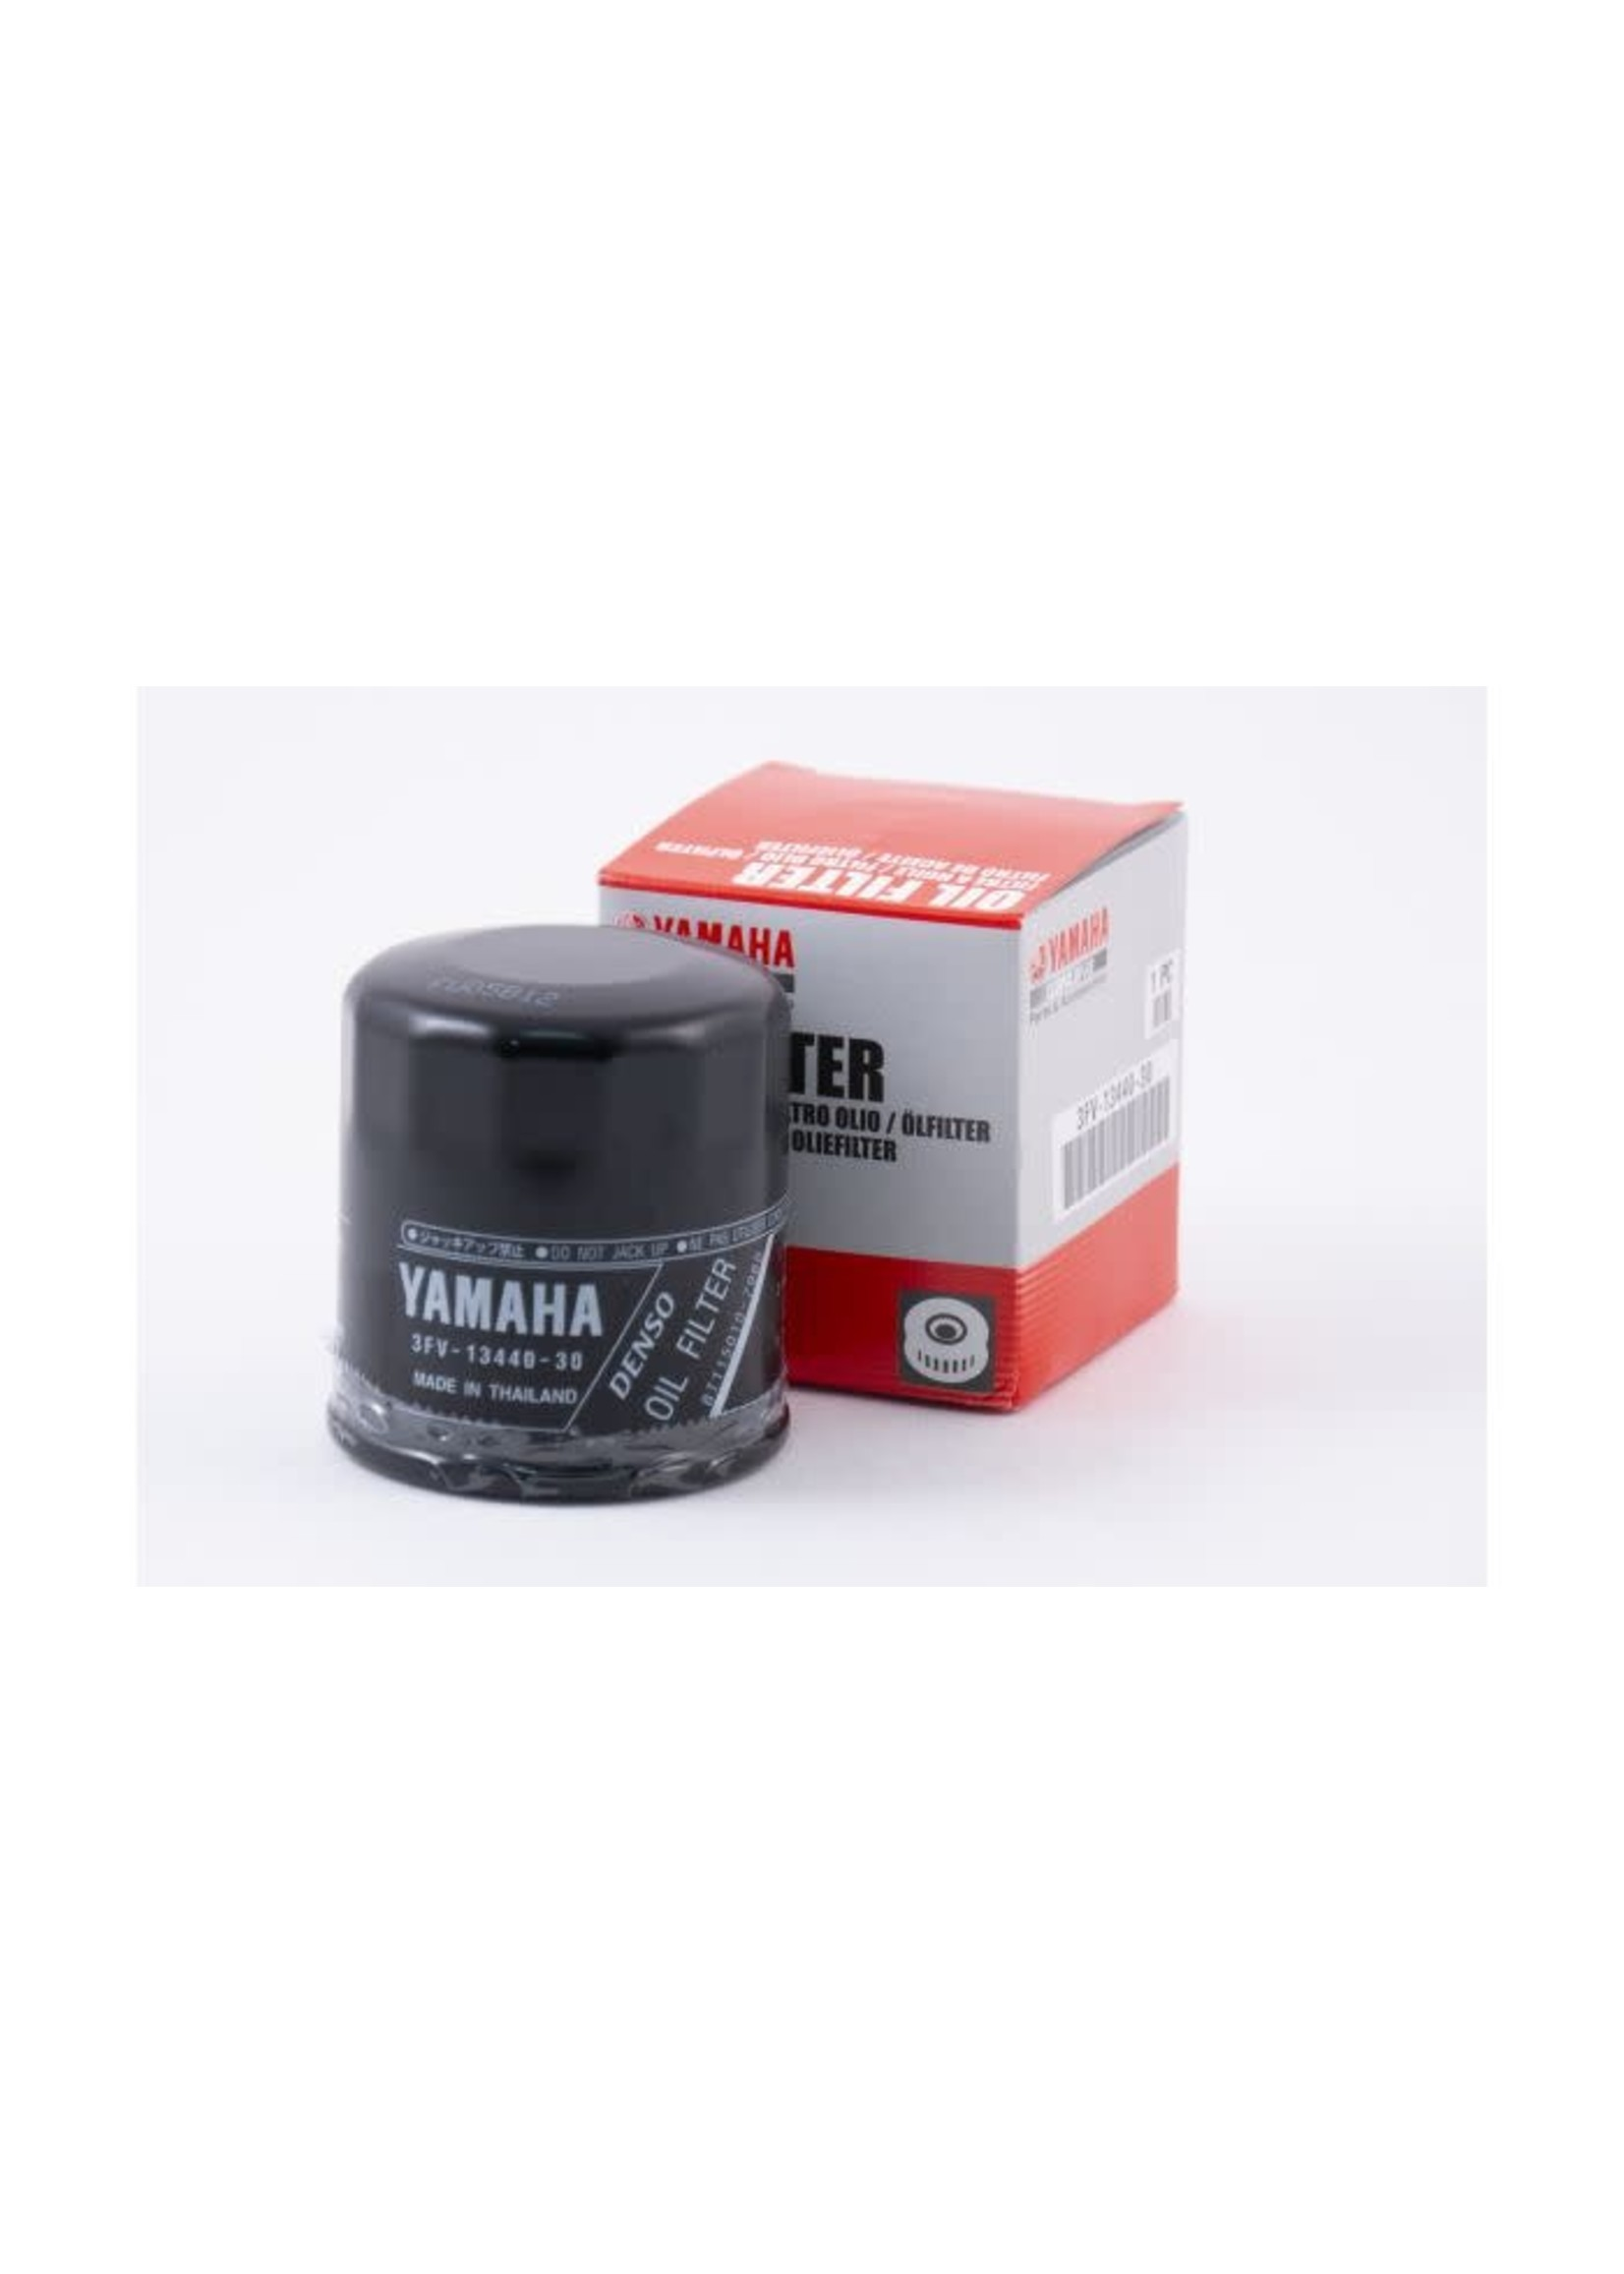 Yamaha OIL FILTER, YAMAHA, 3FV-13440-30